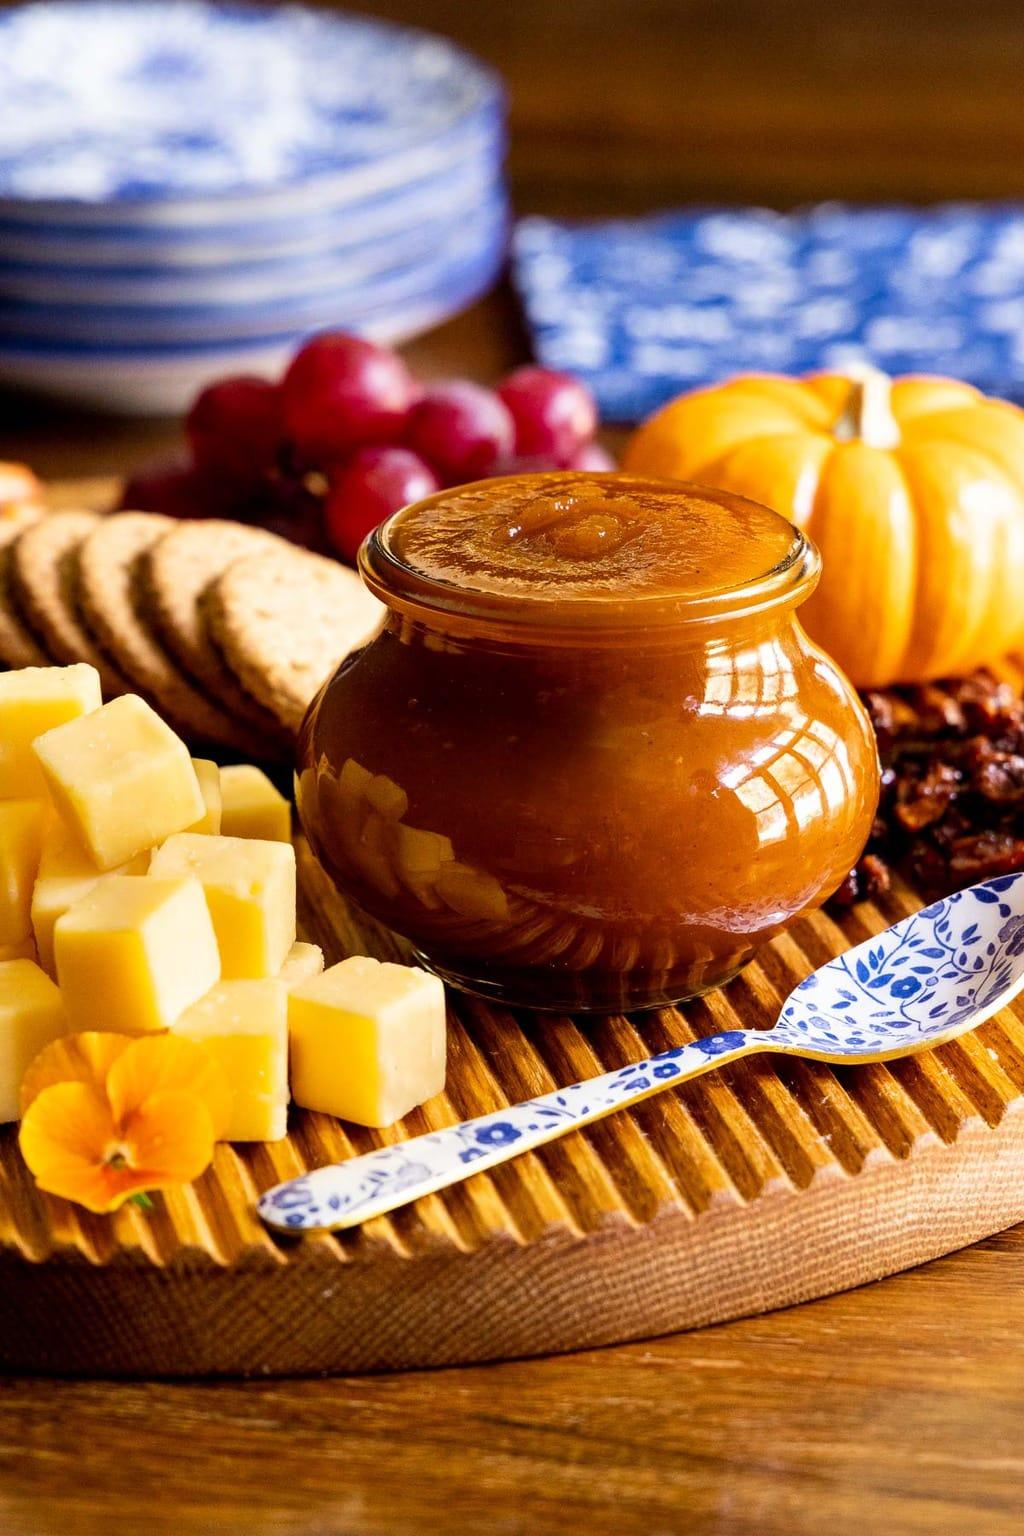 Vertical photo of a fall appetizer tray featuring Pumpkin Jam (Confiture De Citrouille) on a wood cutting board.